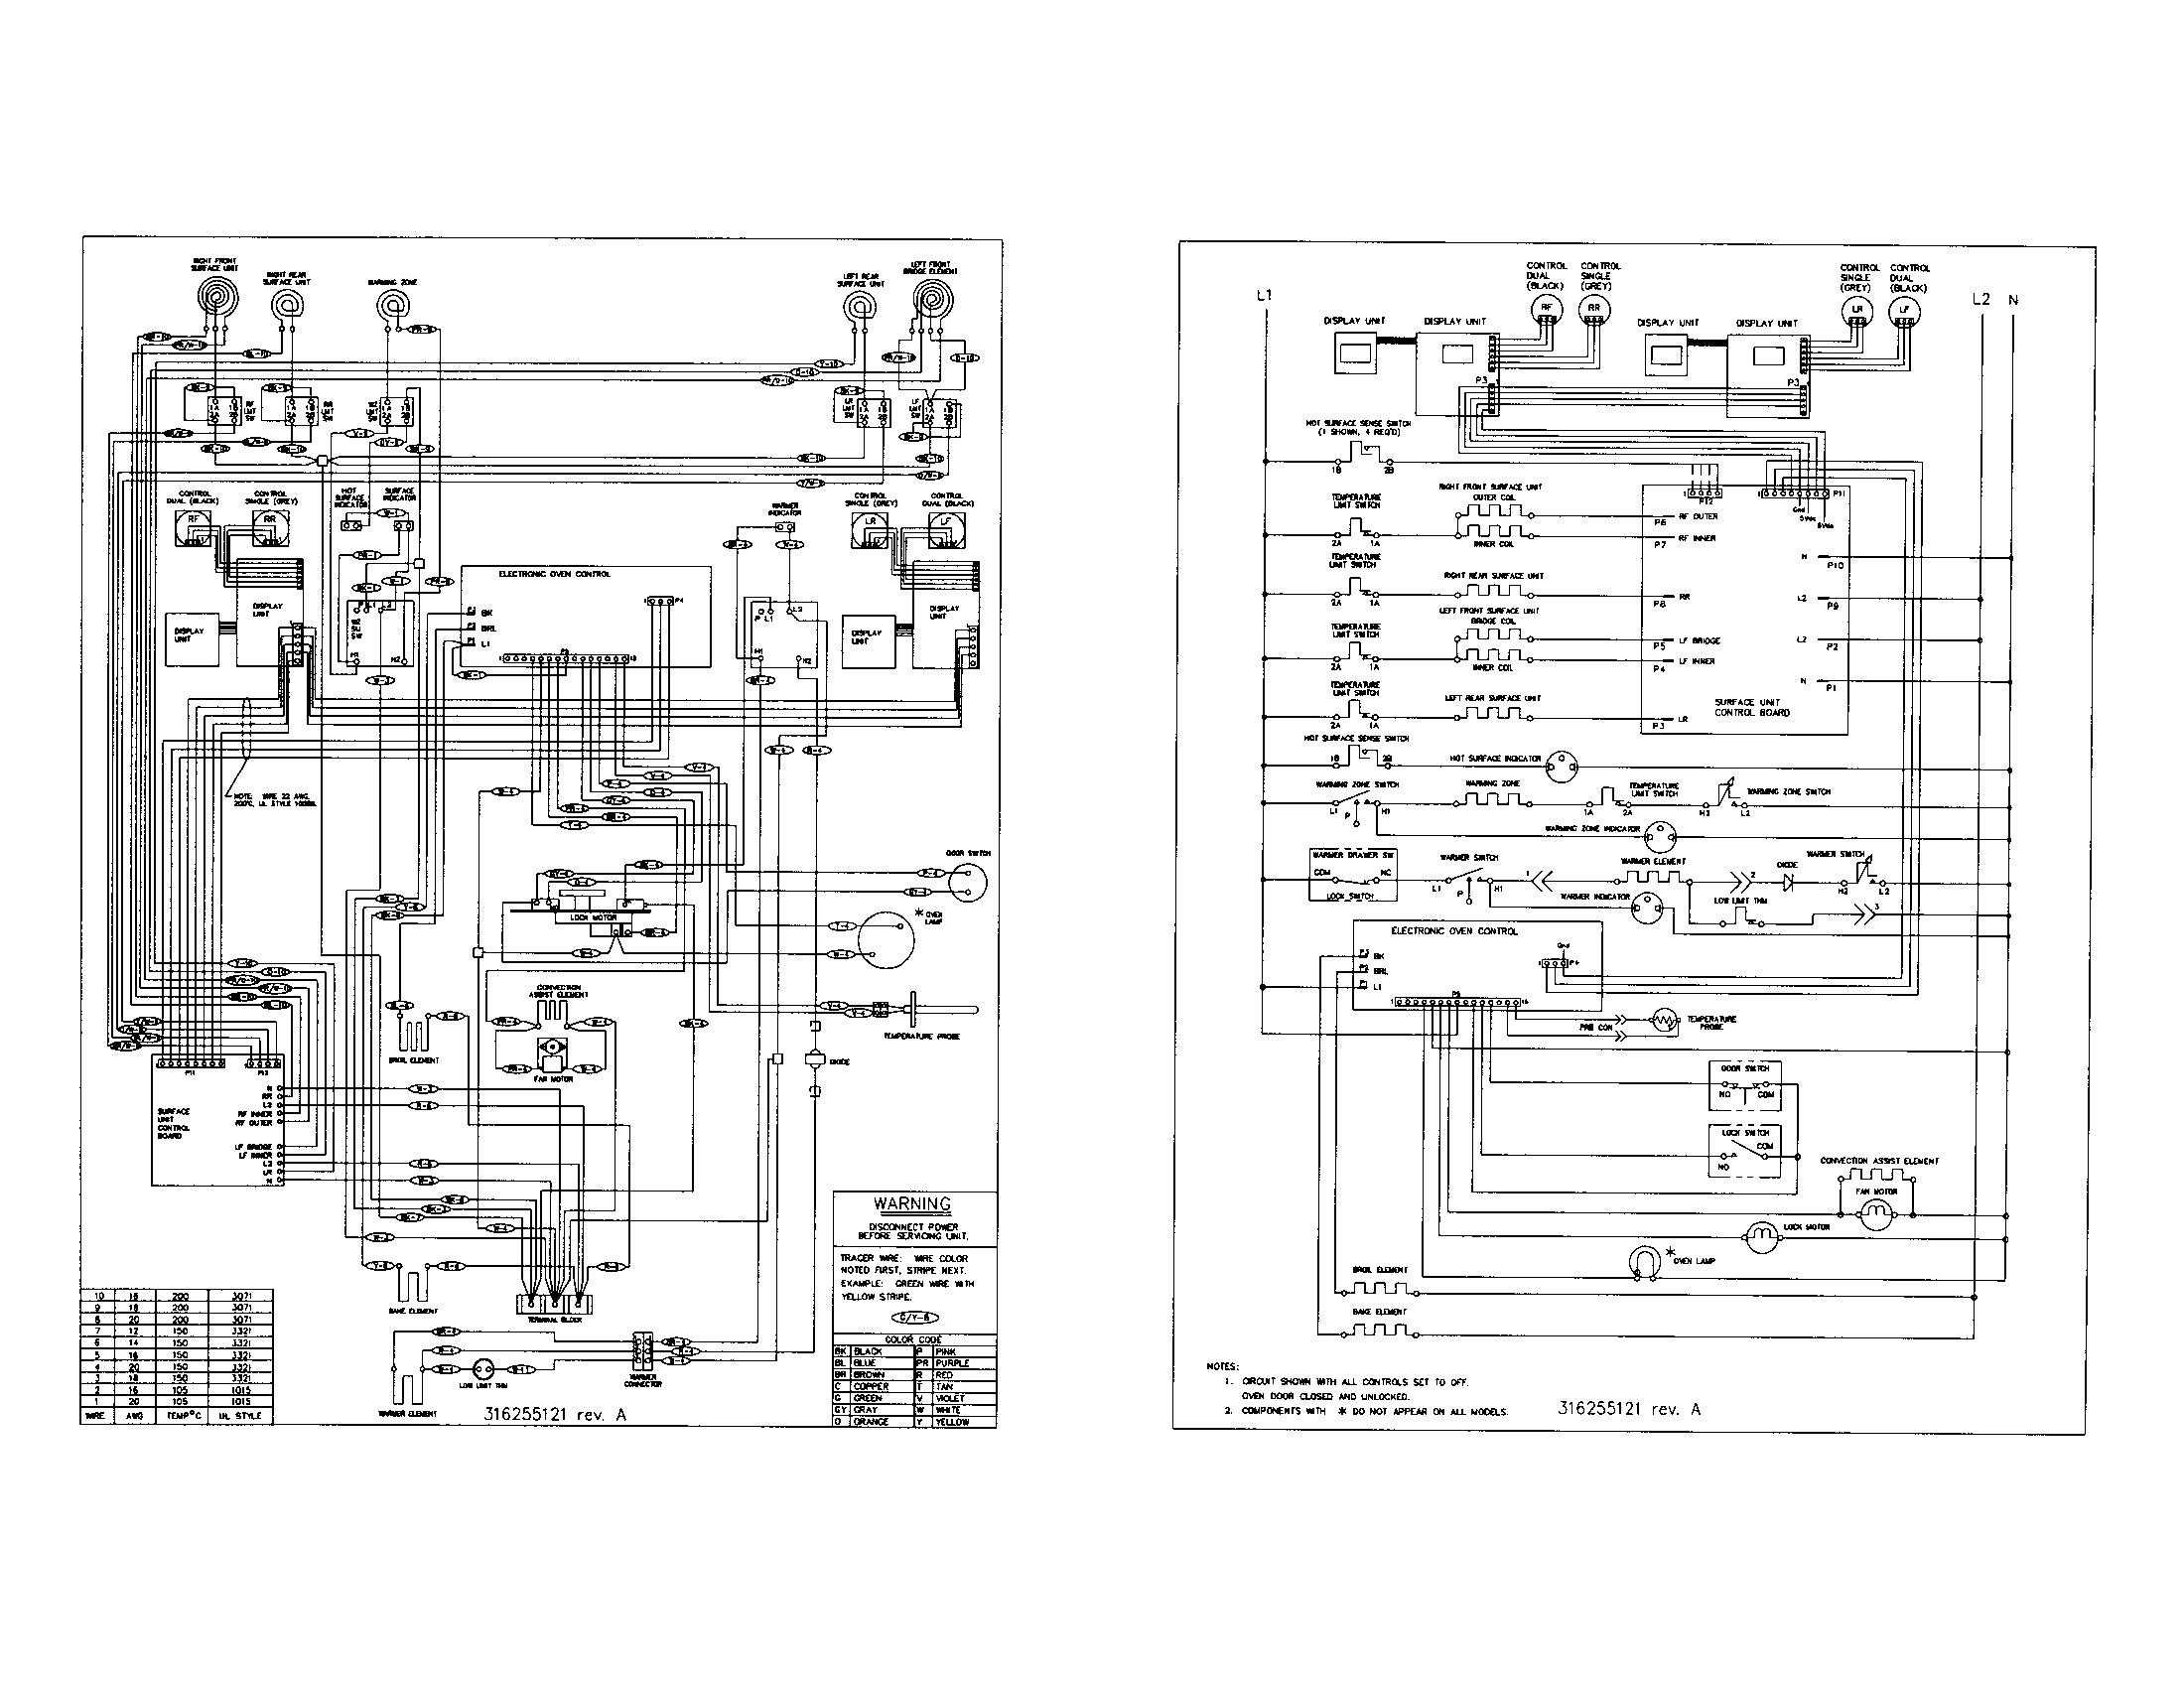 Bosch Dishwasher Wiring Diagram 2 Amazing Dishwasher Wiring Diagram Contemporary Everything You Need Of Bosch Dishwasher Wiring Diagram 2